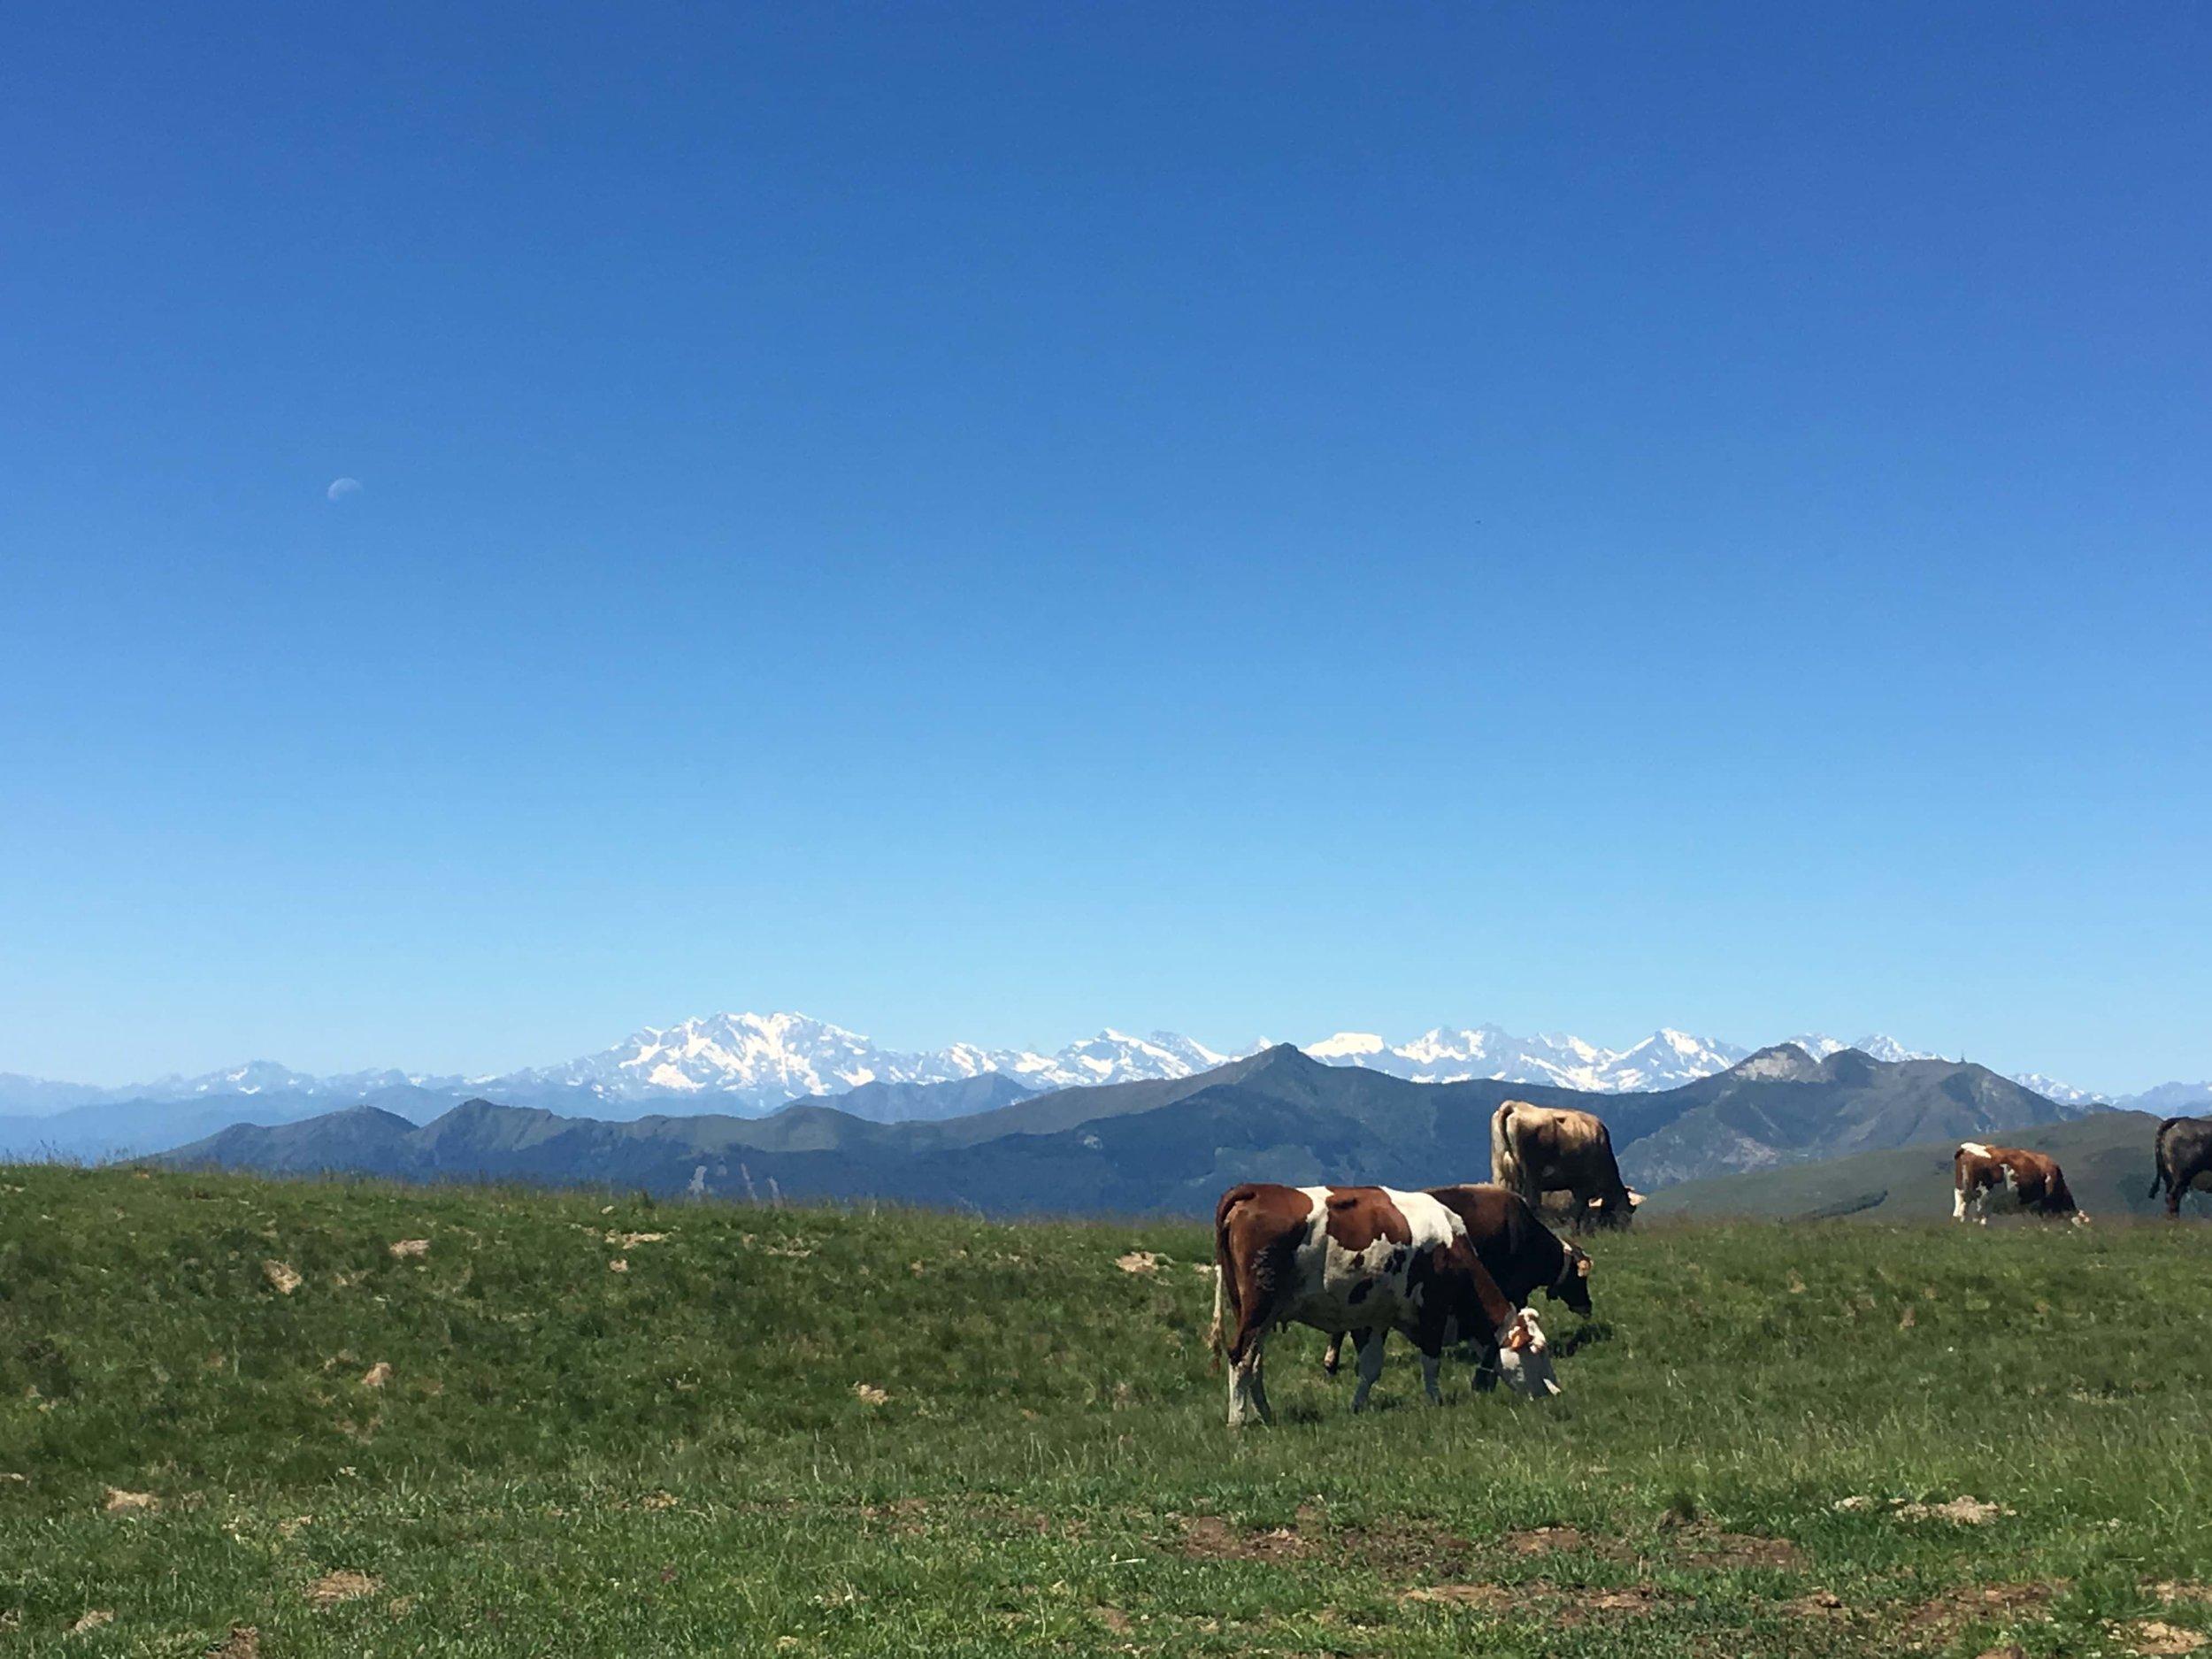 Cows_panorama_scenictrail_hikingcomolake.jpg